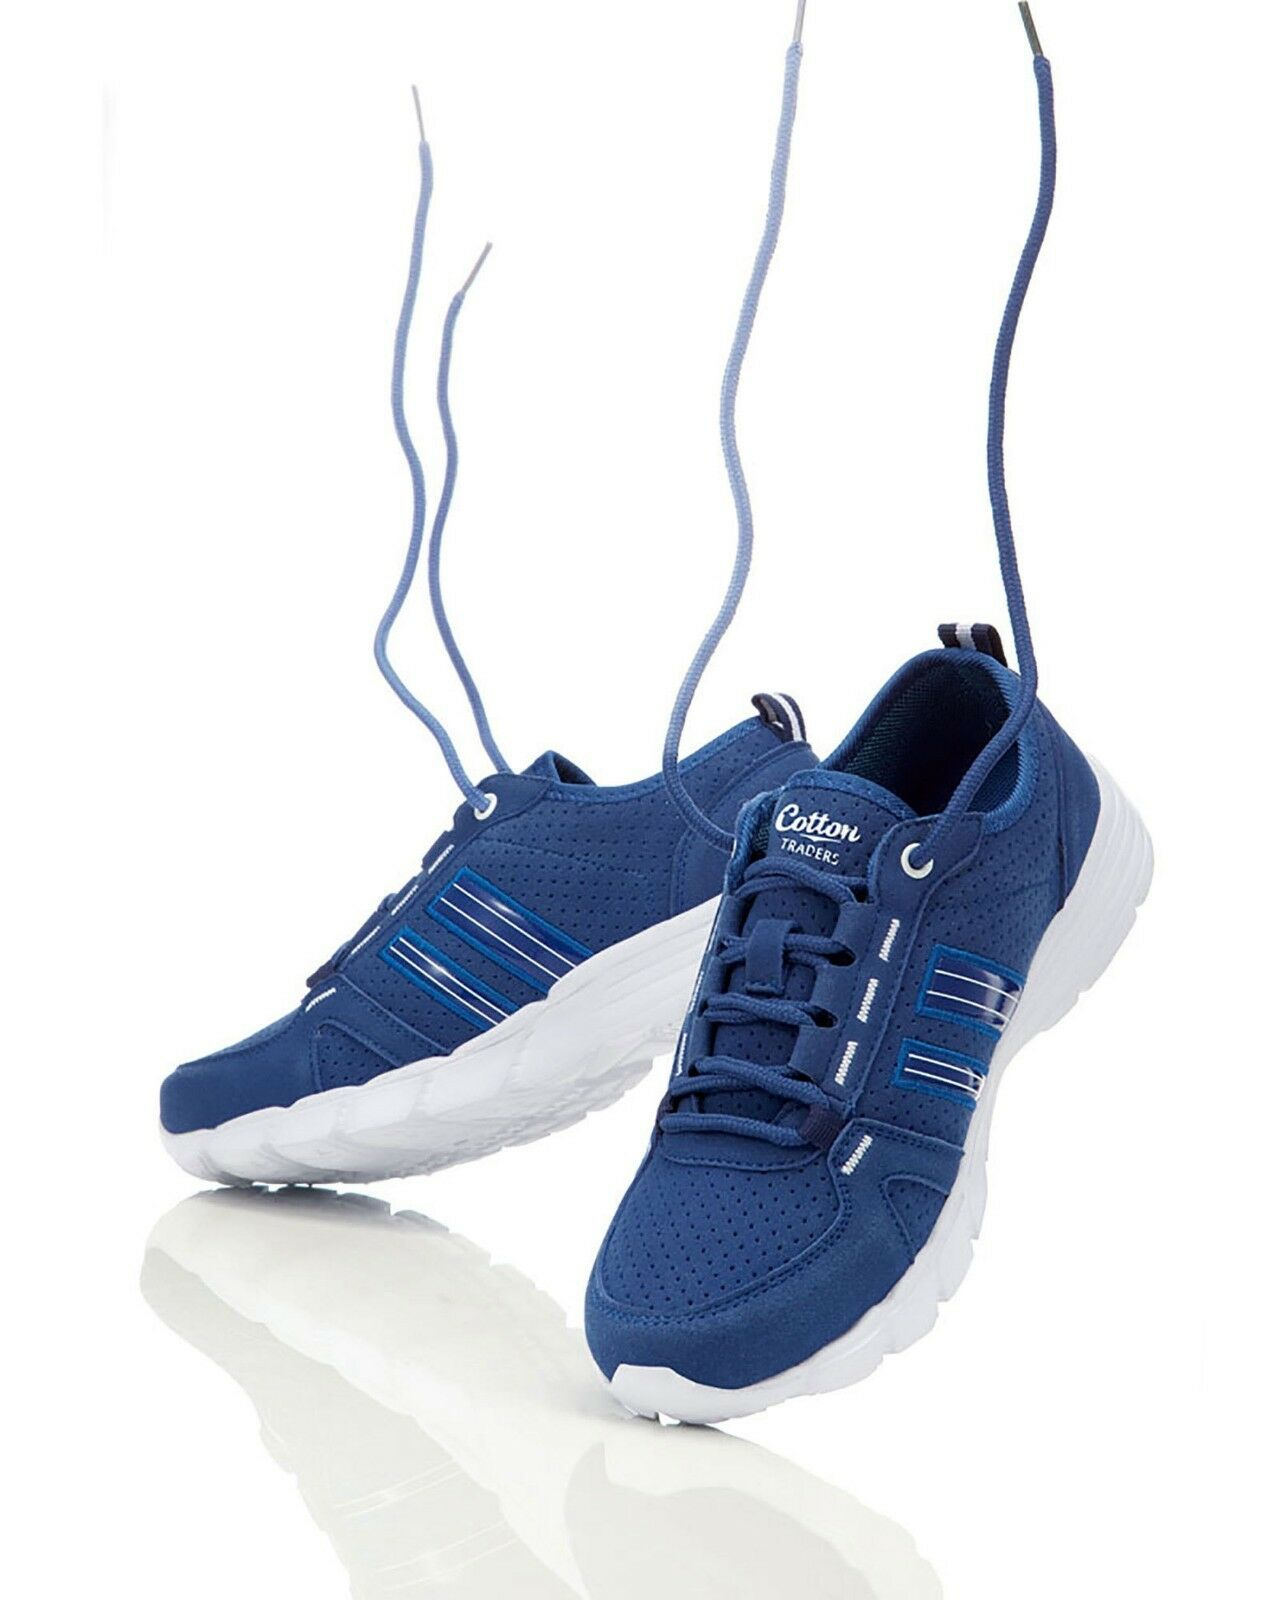 Cotton Traders incroyablement léger Chaussures Bleu-UK 6 EU 39 JS088 HH 05